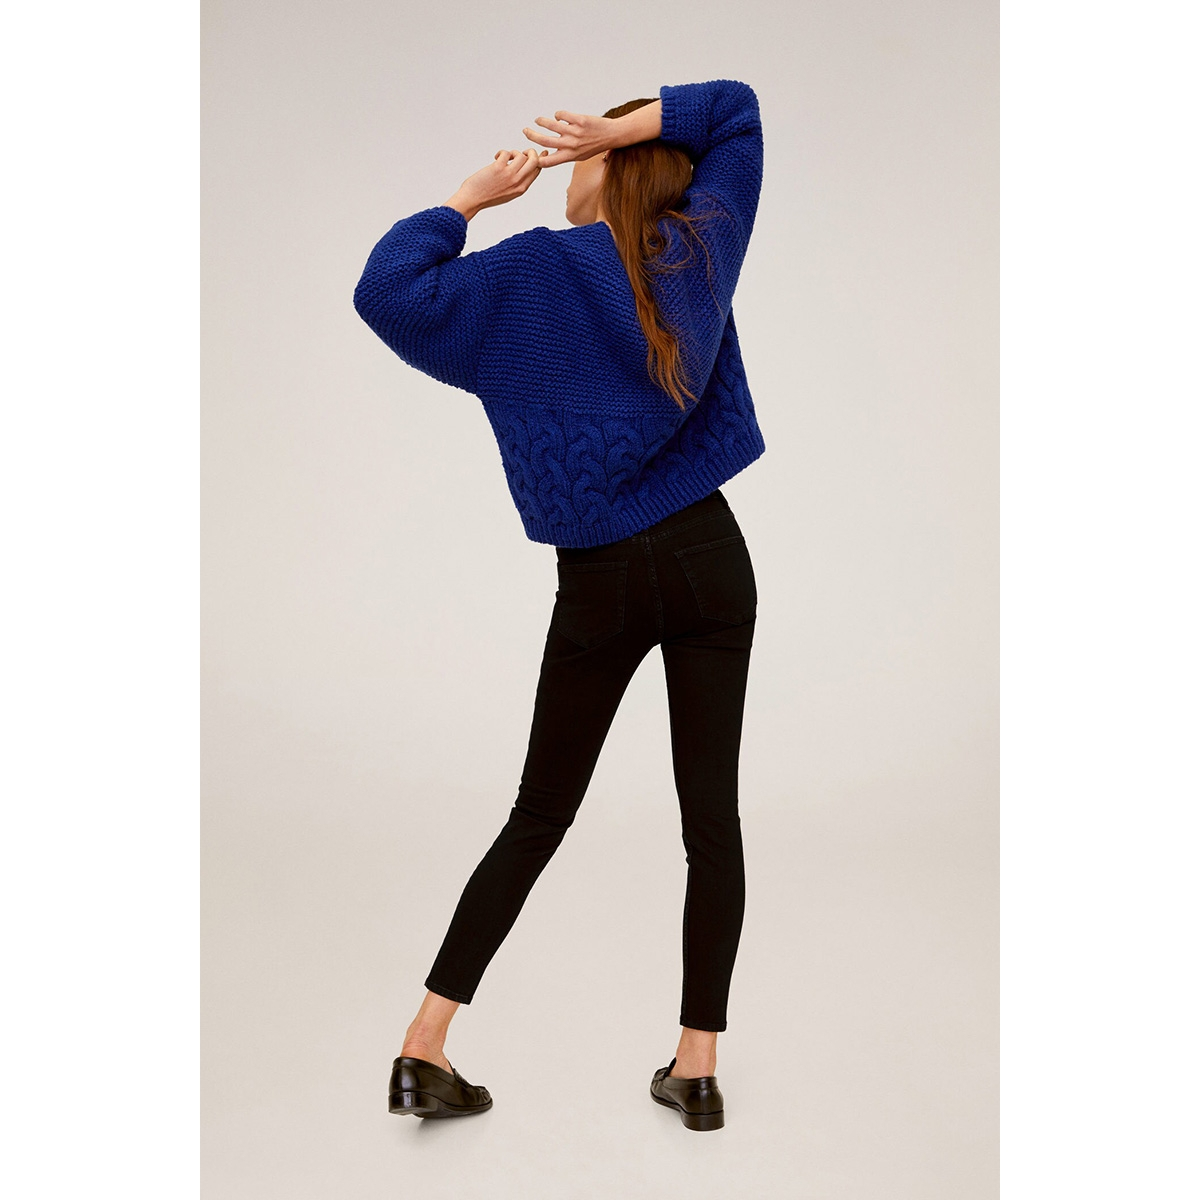 skinny sculpt jeans 67010527 mango jeans tn